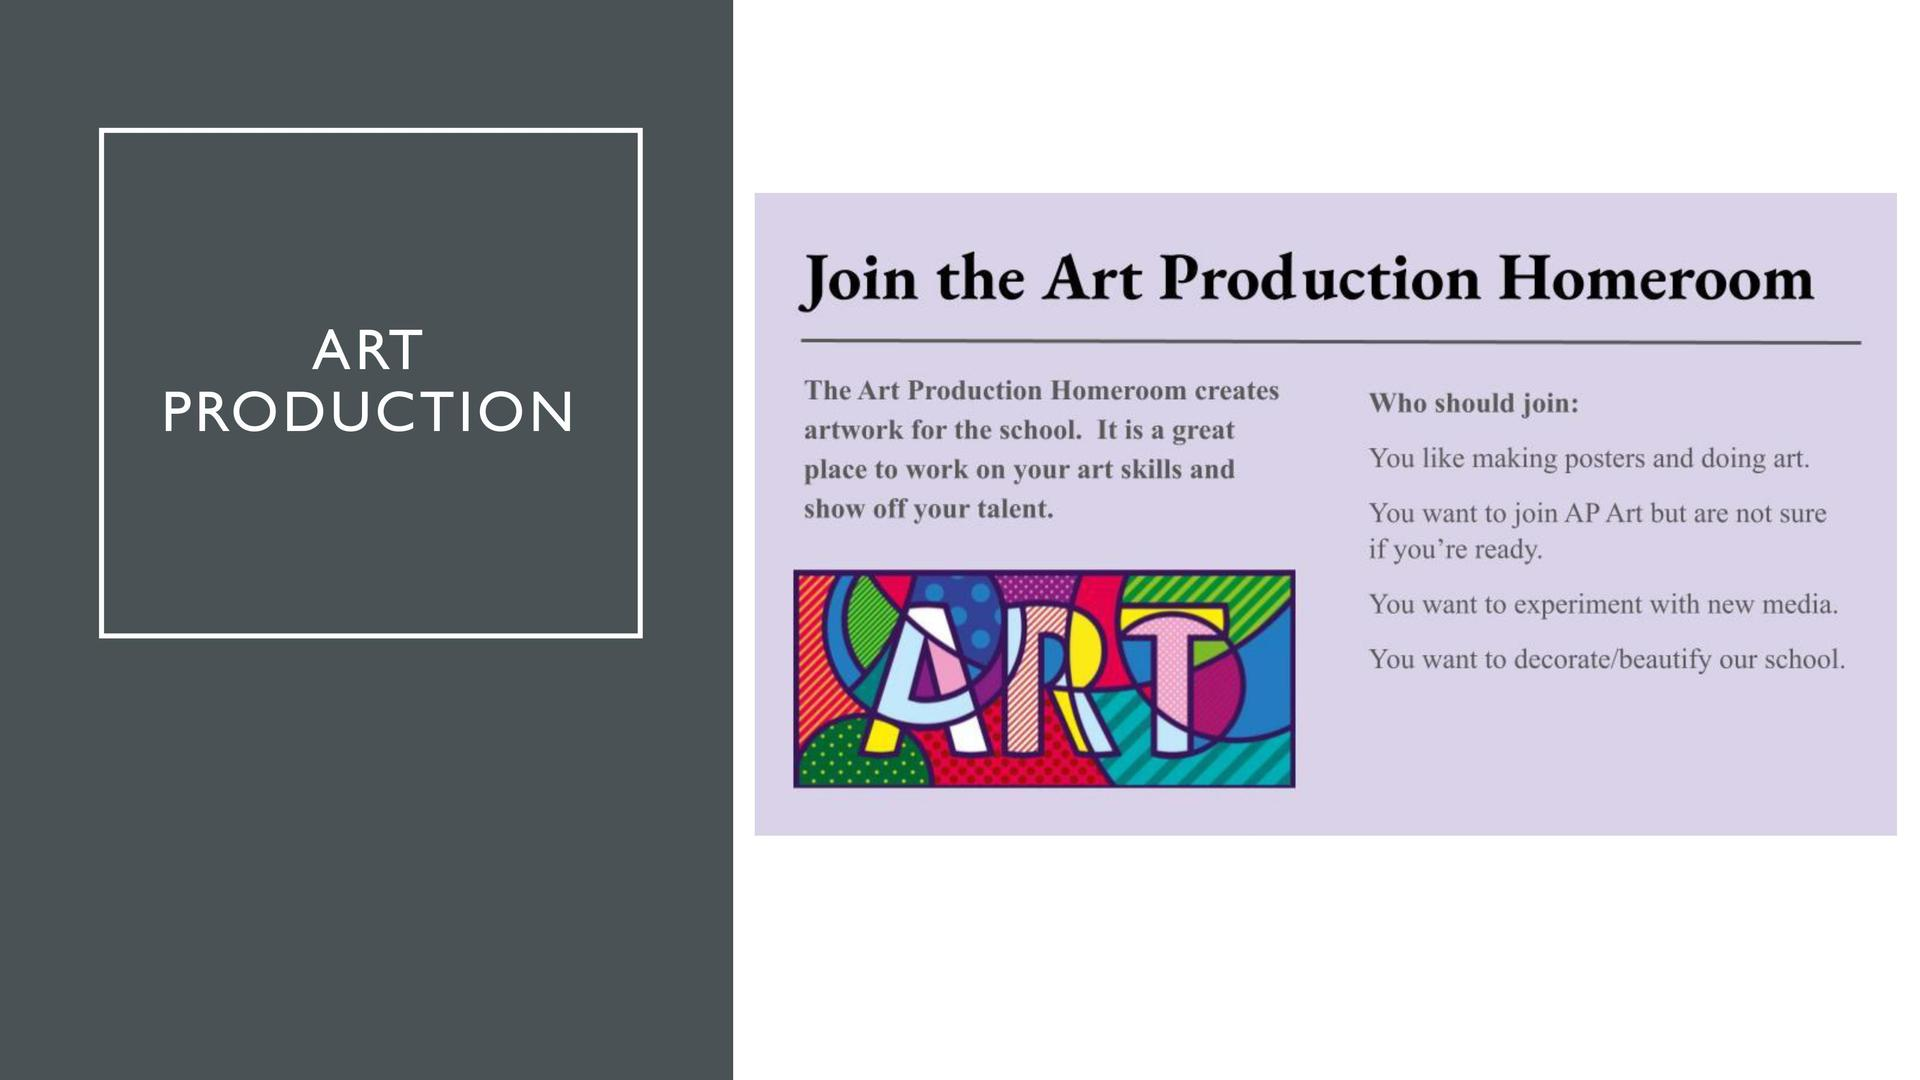 Art Production Advisory